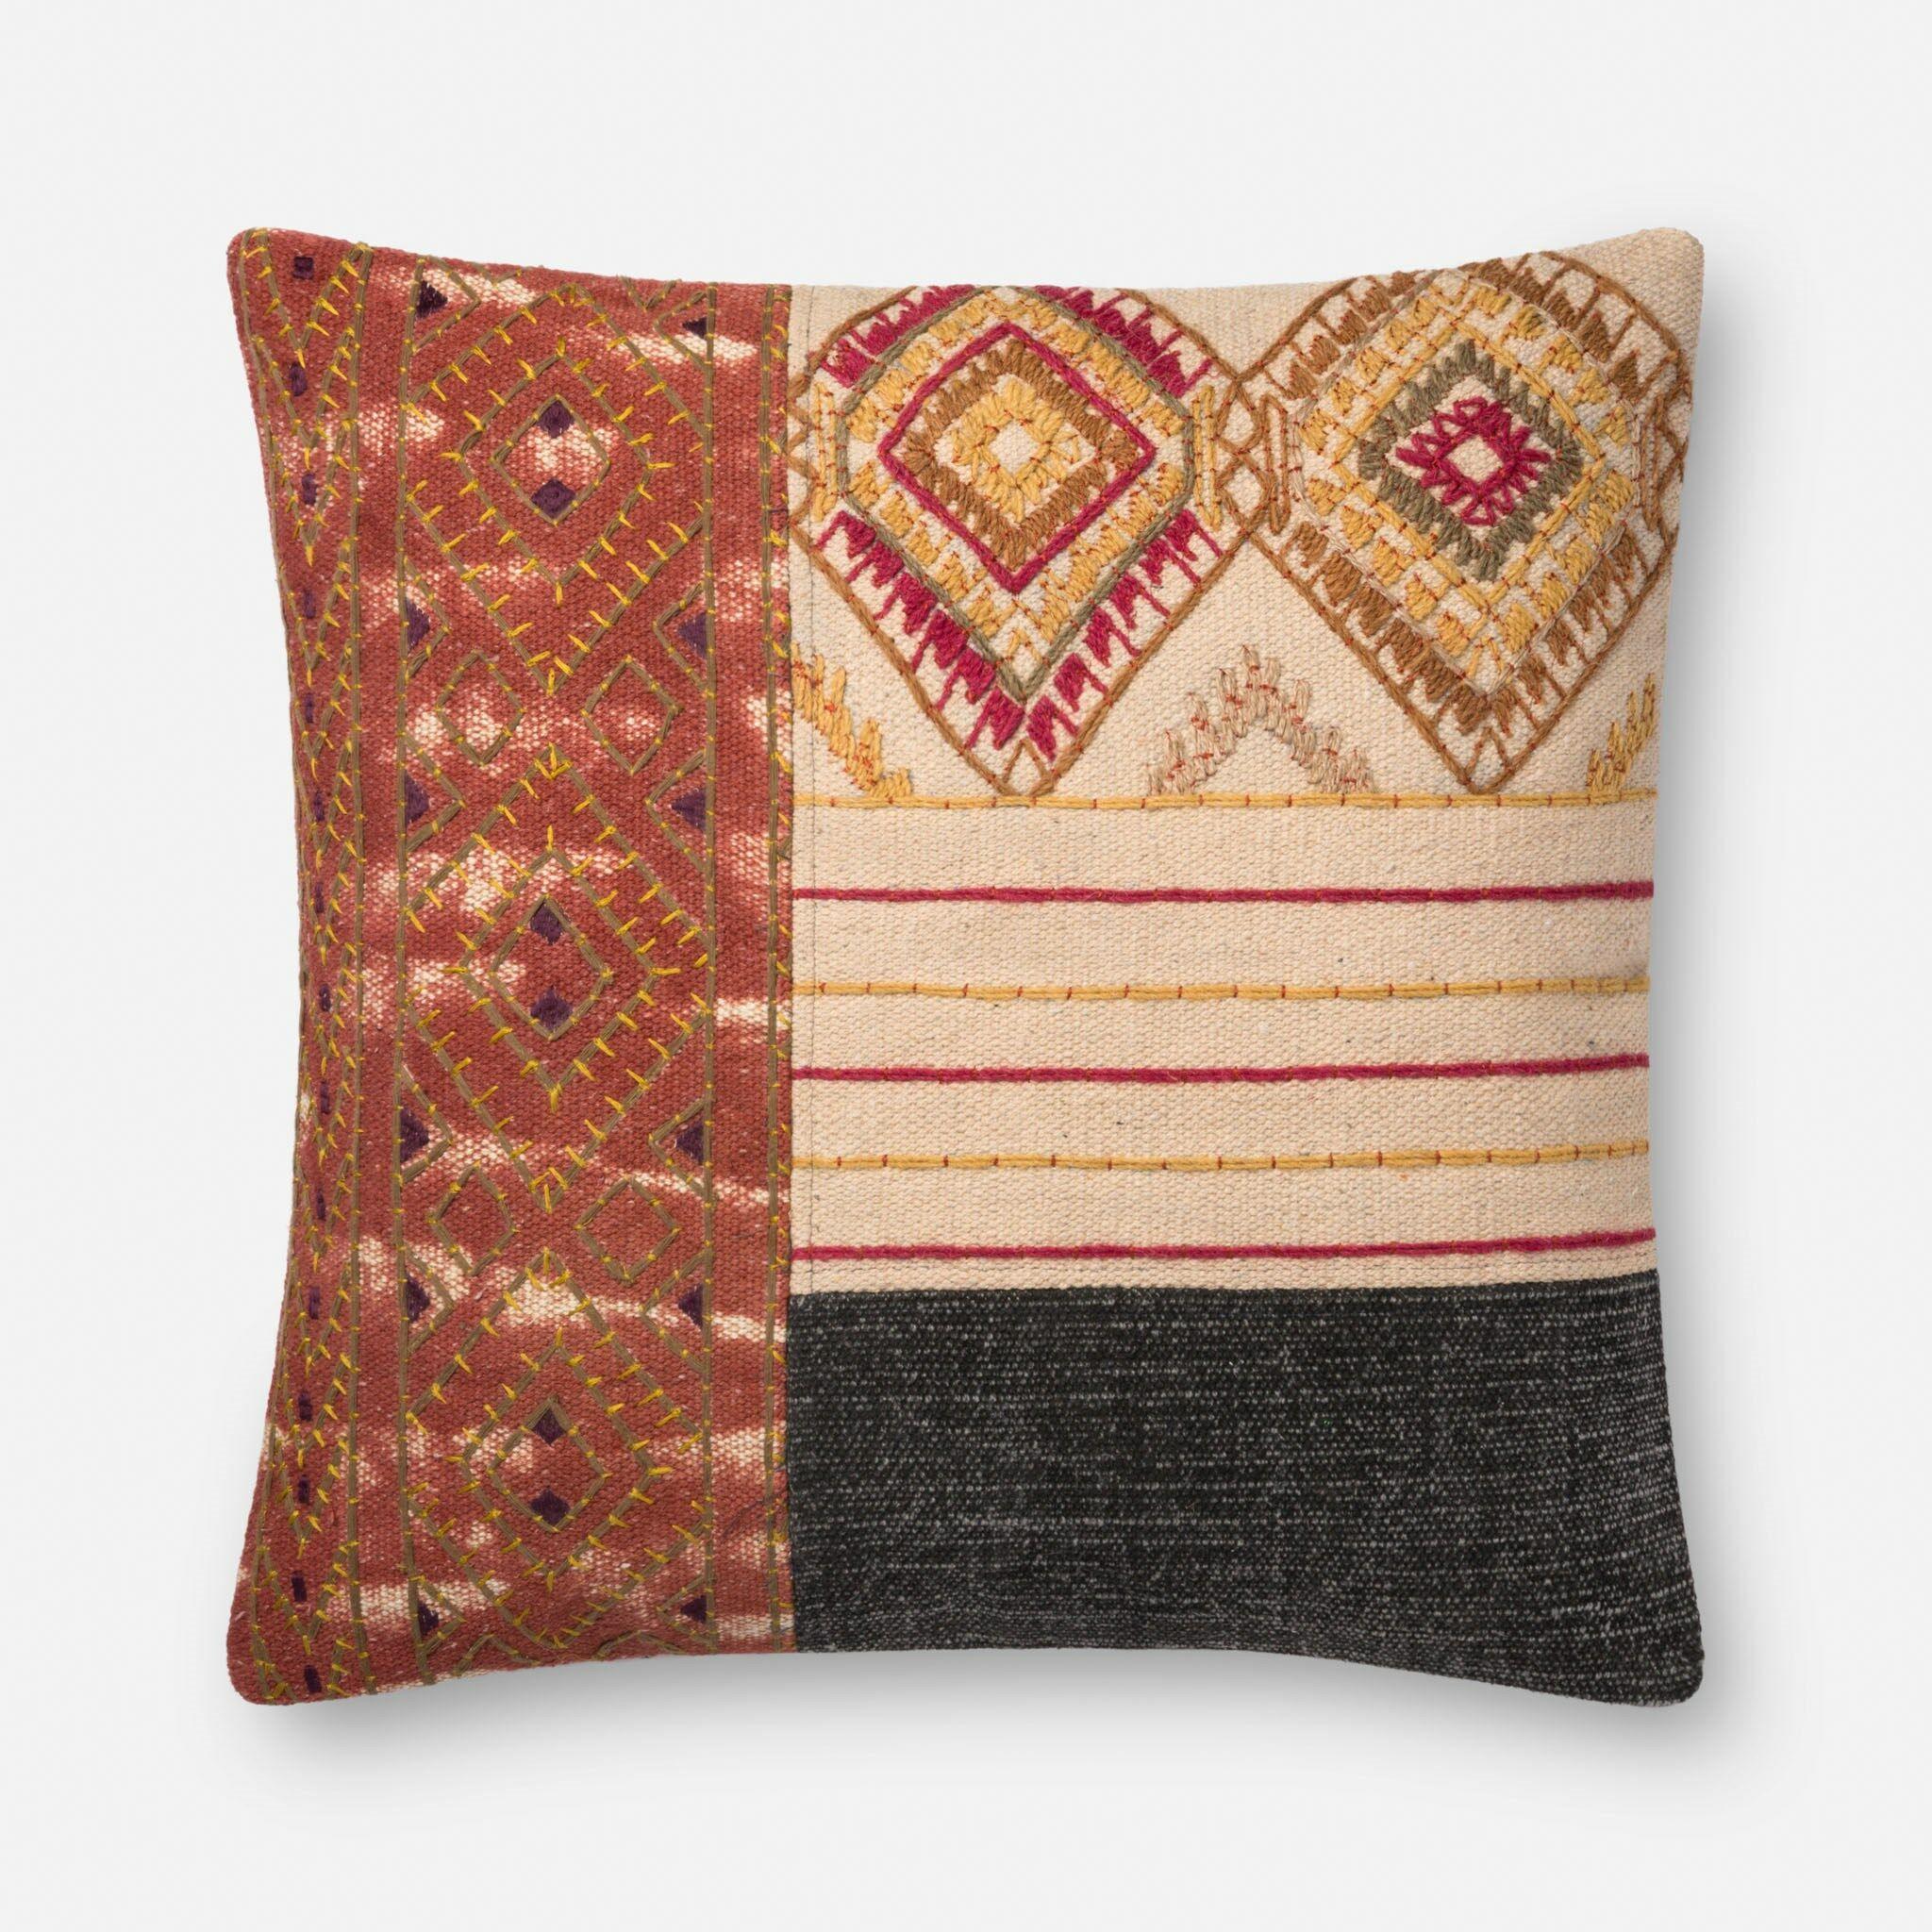 Stockton Pillow Fill Material: Polyester/Polyfill